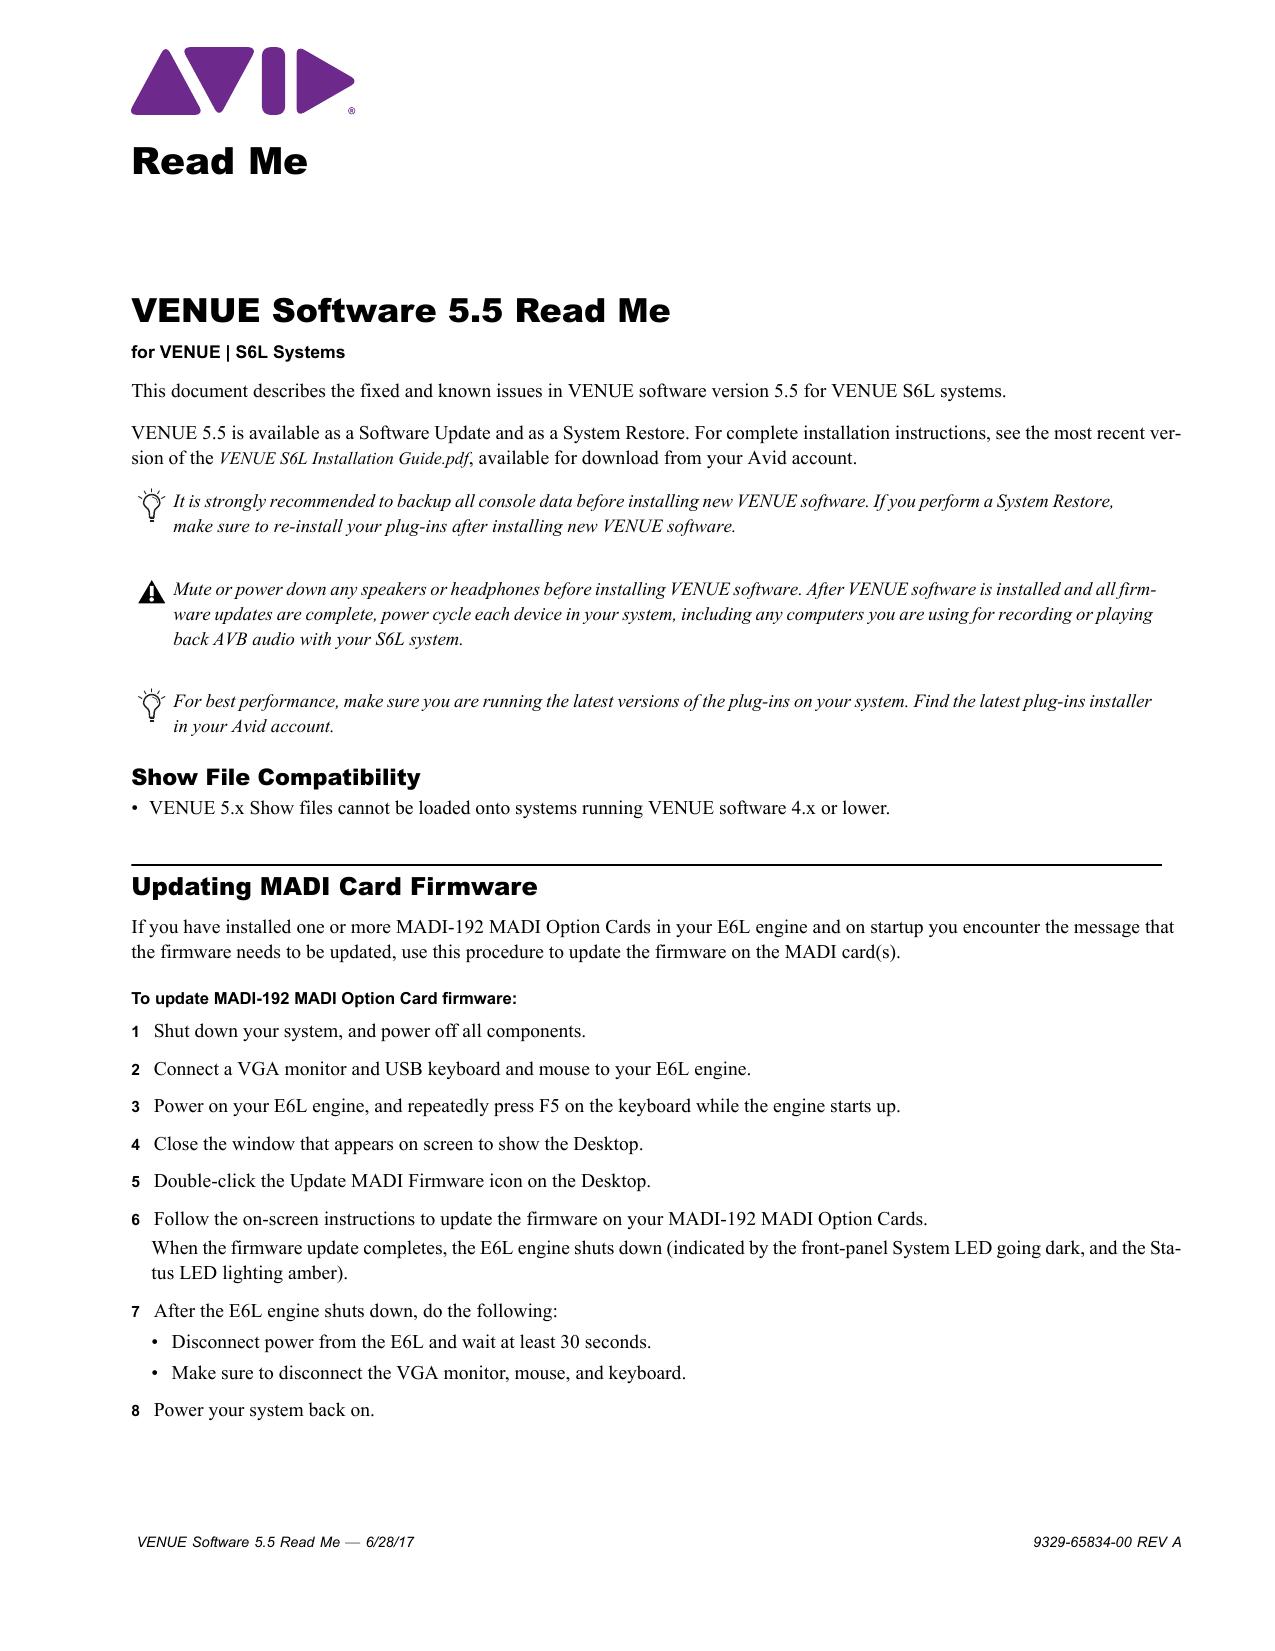 S6L Avb Driver For Mac